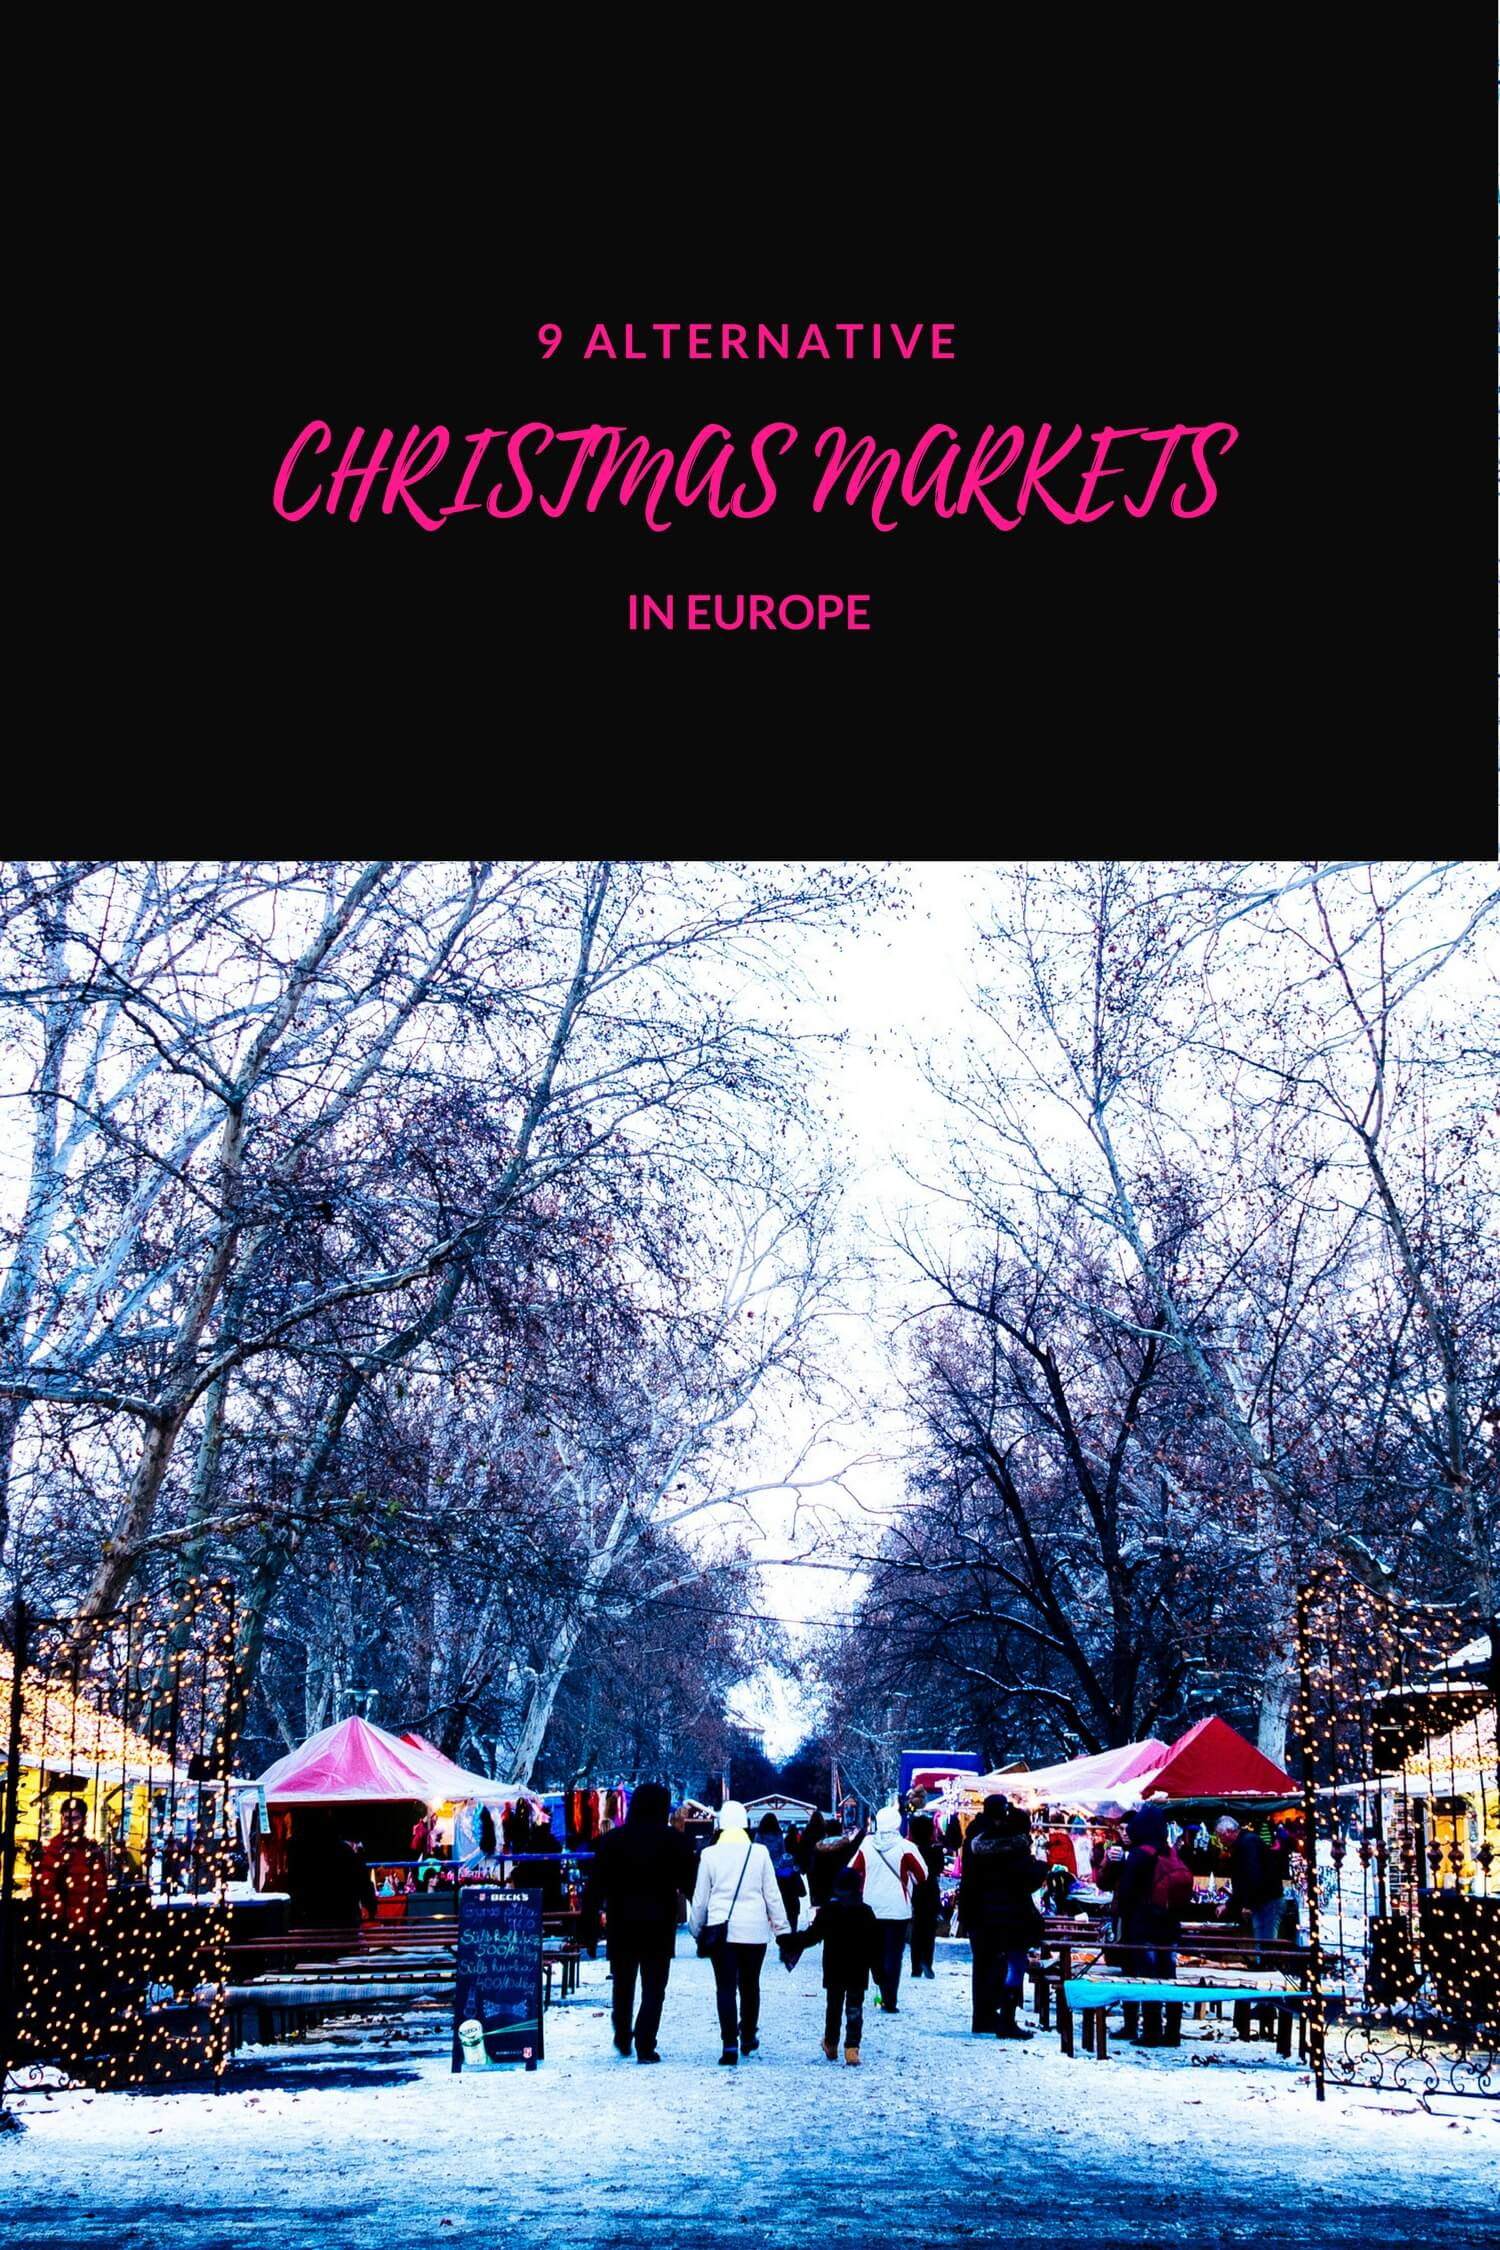 Alternative Christmas Markets